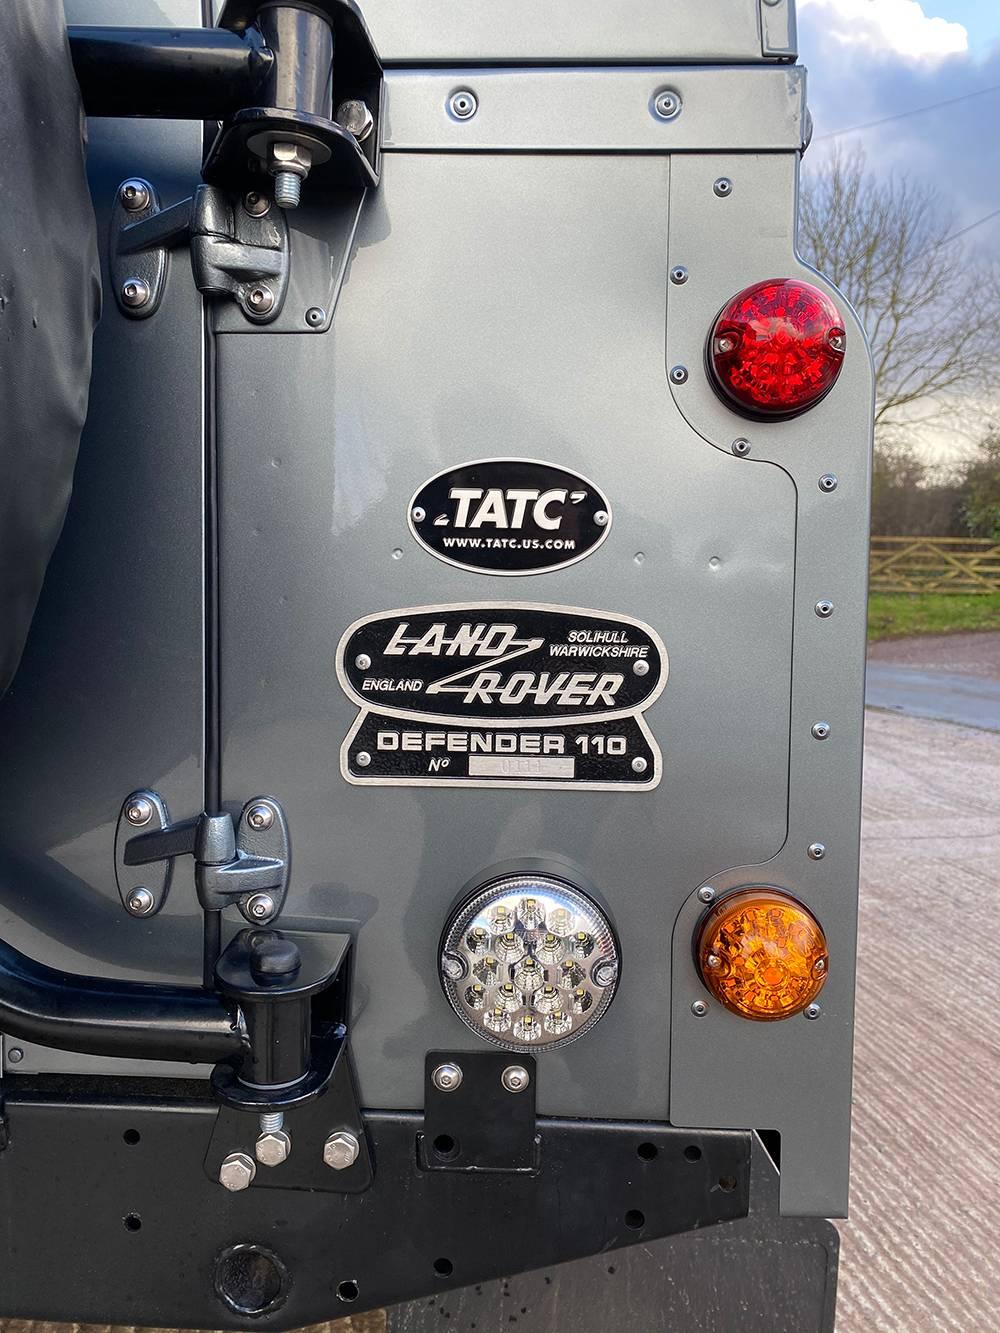 Land Rover D110 Metallic Grey 8525